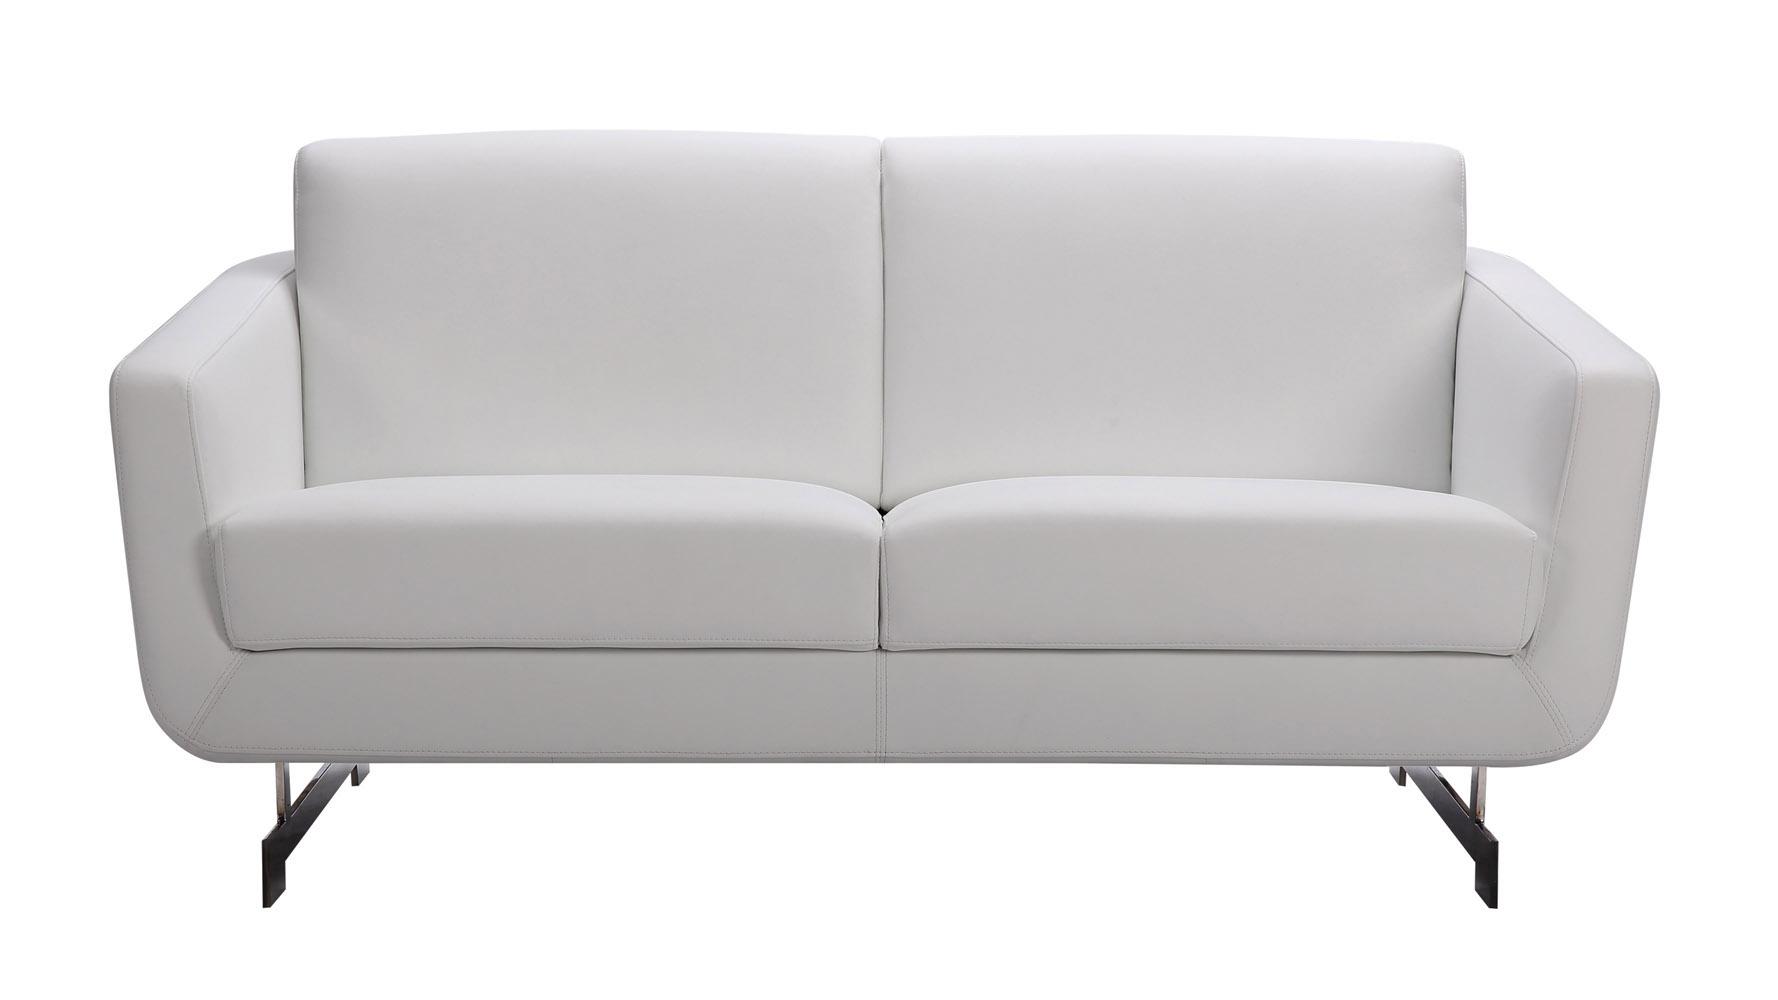 swivel chair sofa set cape cod beach hours armondo with zuri furniture